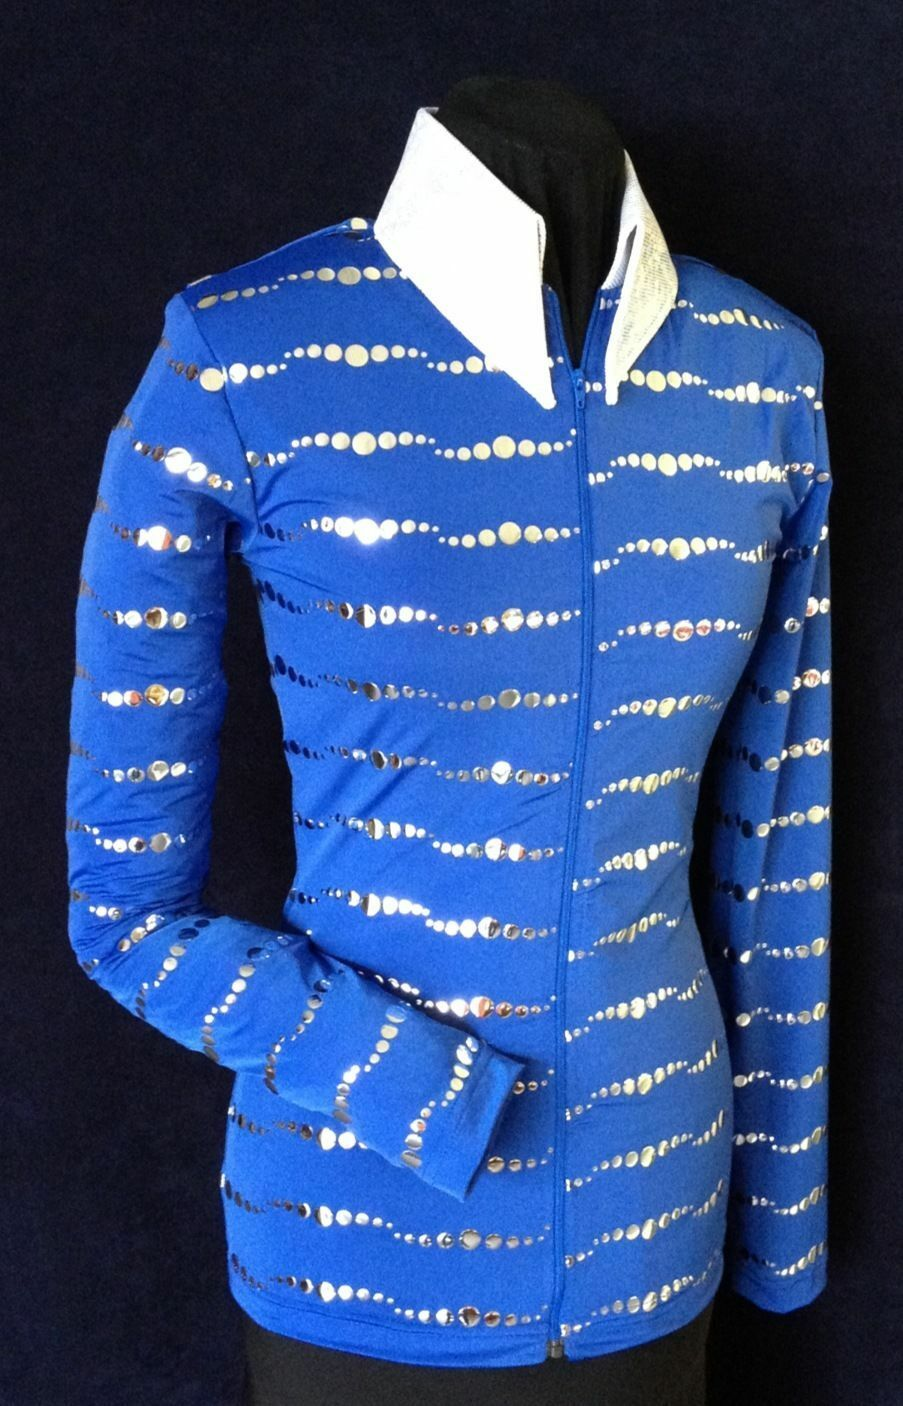 Arena Parade Rodeo Queen  Showmanship Horsemanship Adult Shirt by Riding High USA  best fashion